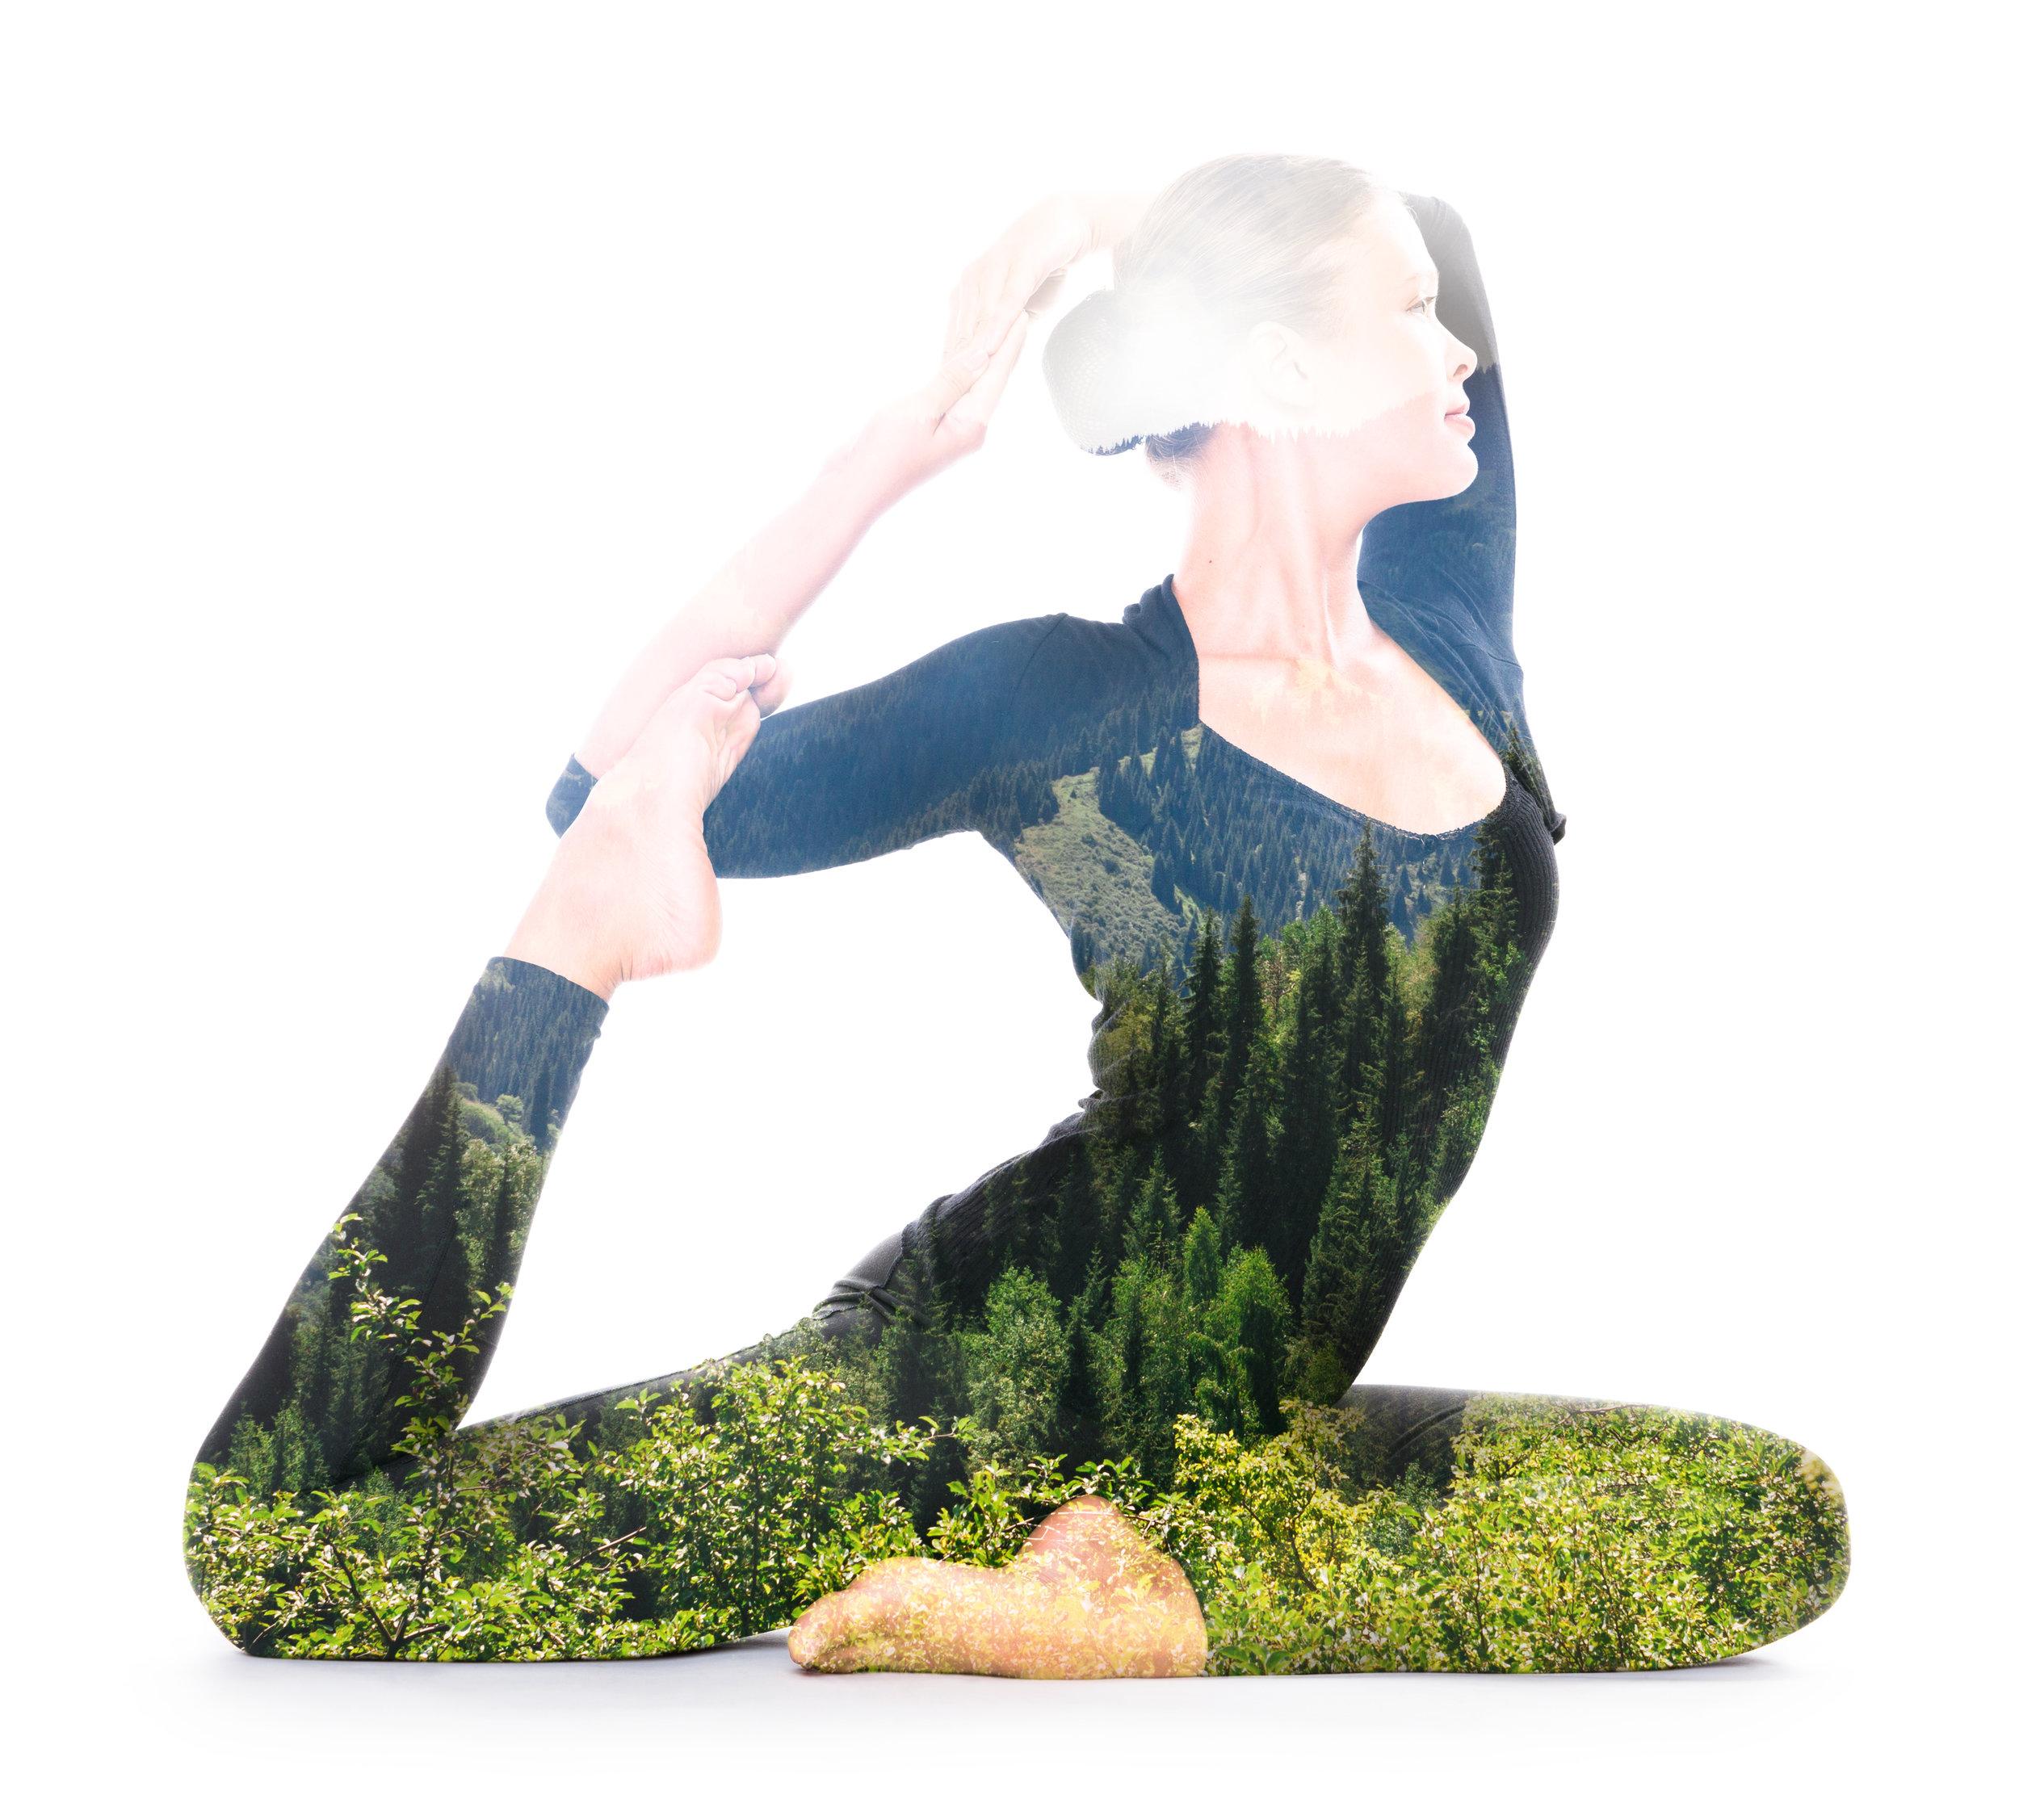 Yoga_double_exposure_by_Victor_Tondee.jpg